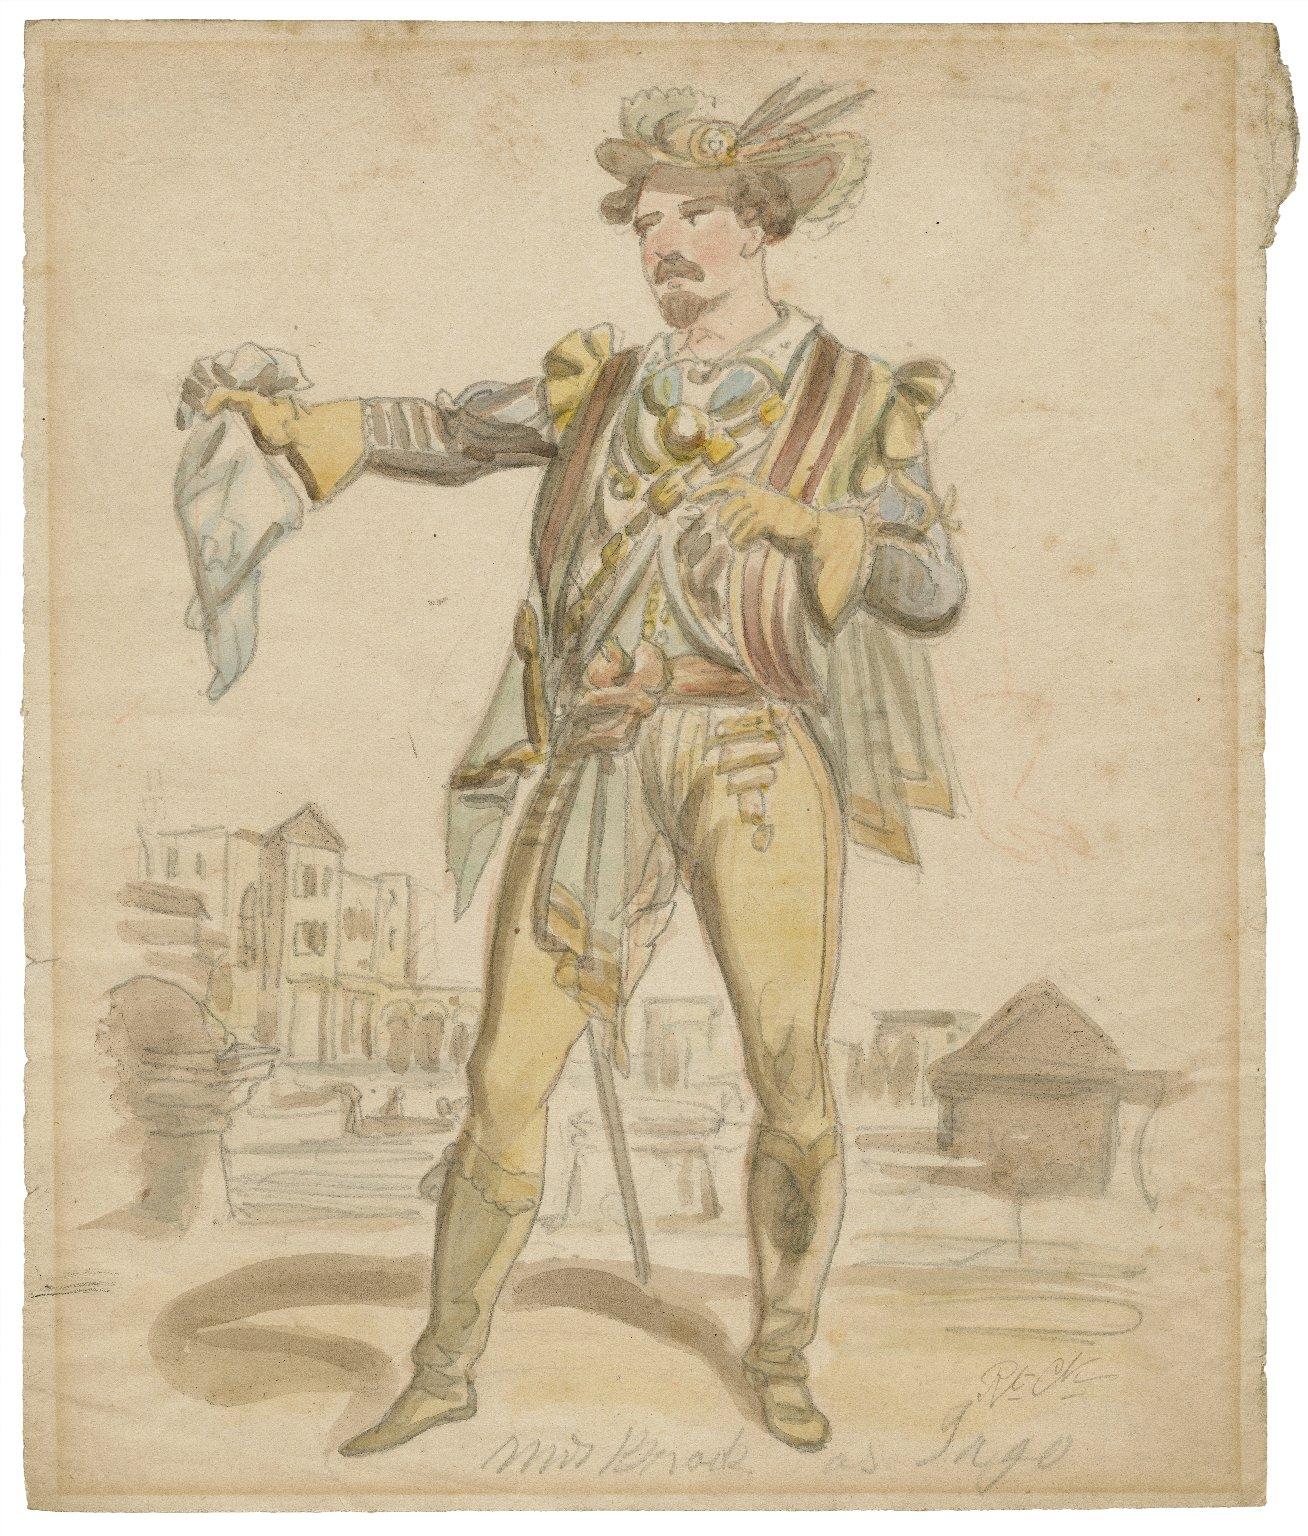 Mr. Brook [sic] as Iago [graphic] / [Issac Robert Cruikshank, probable artist].